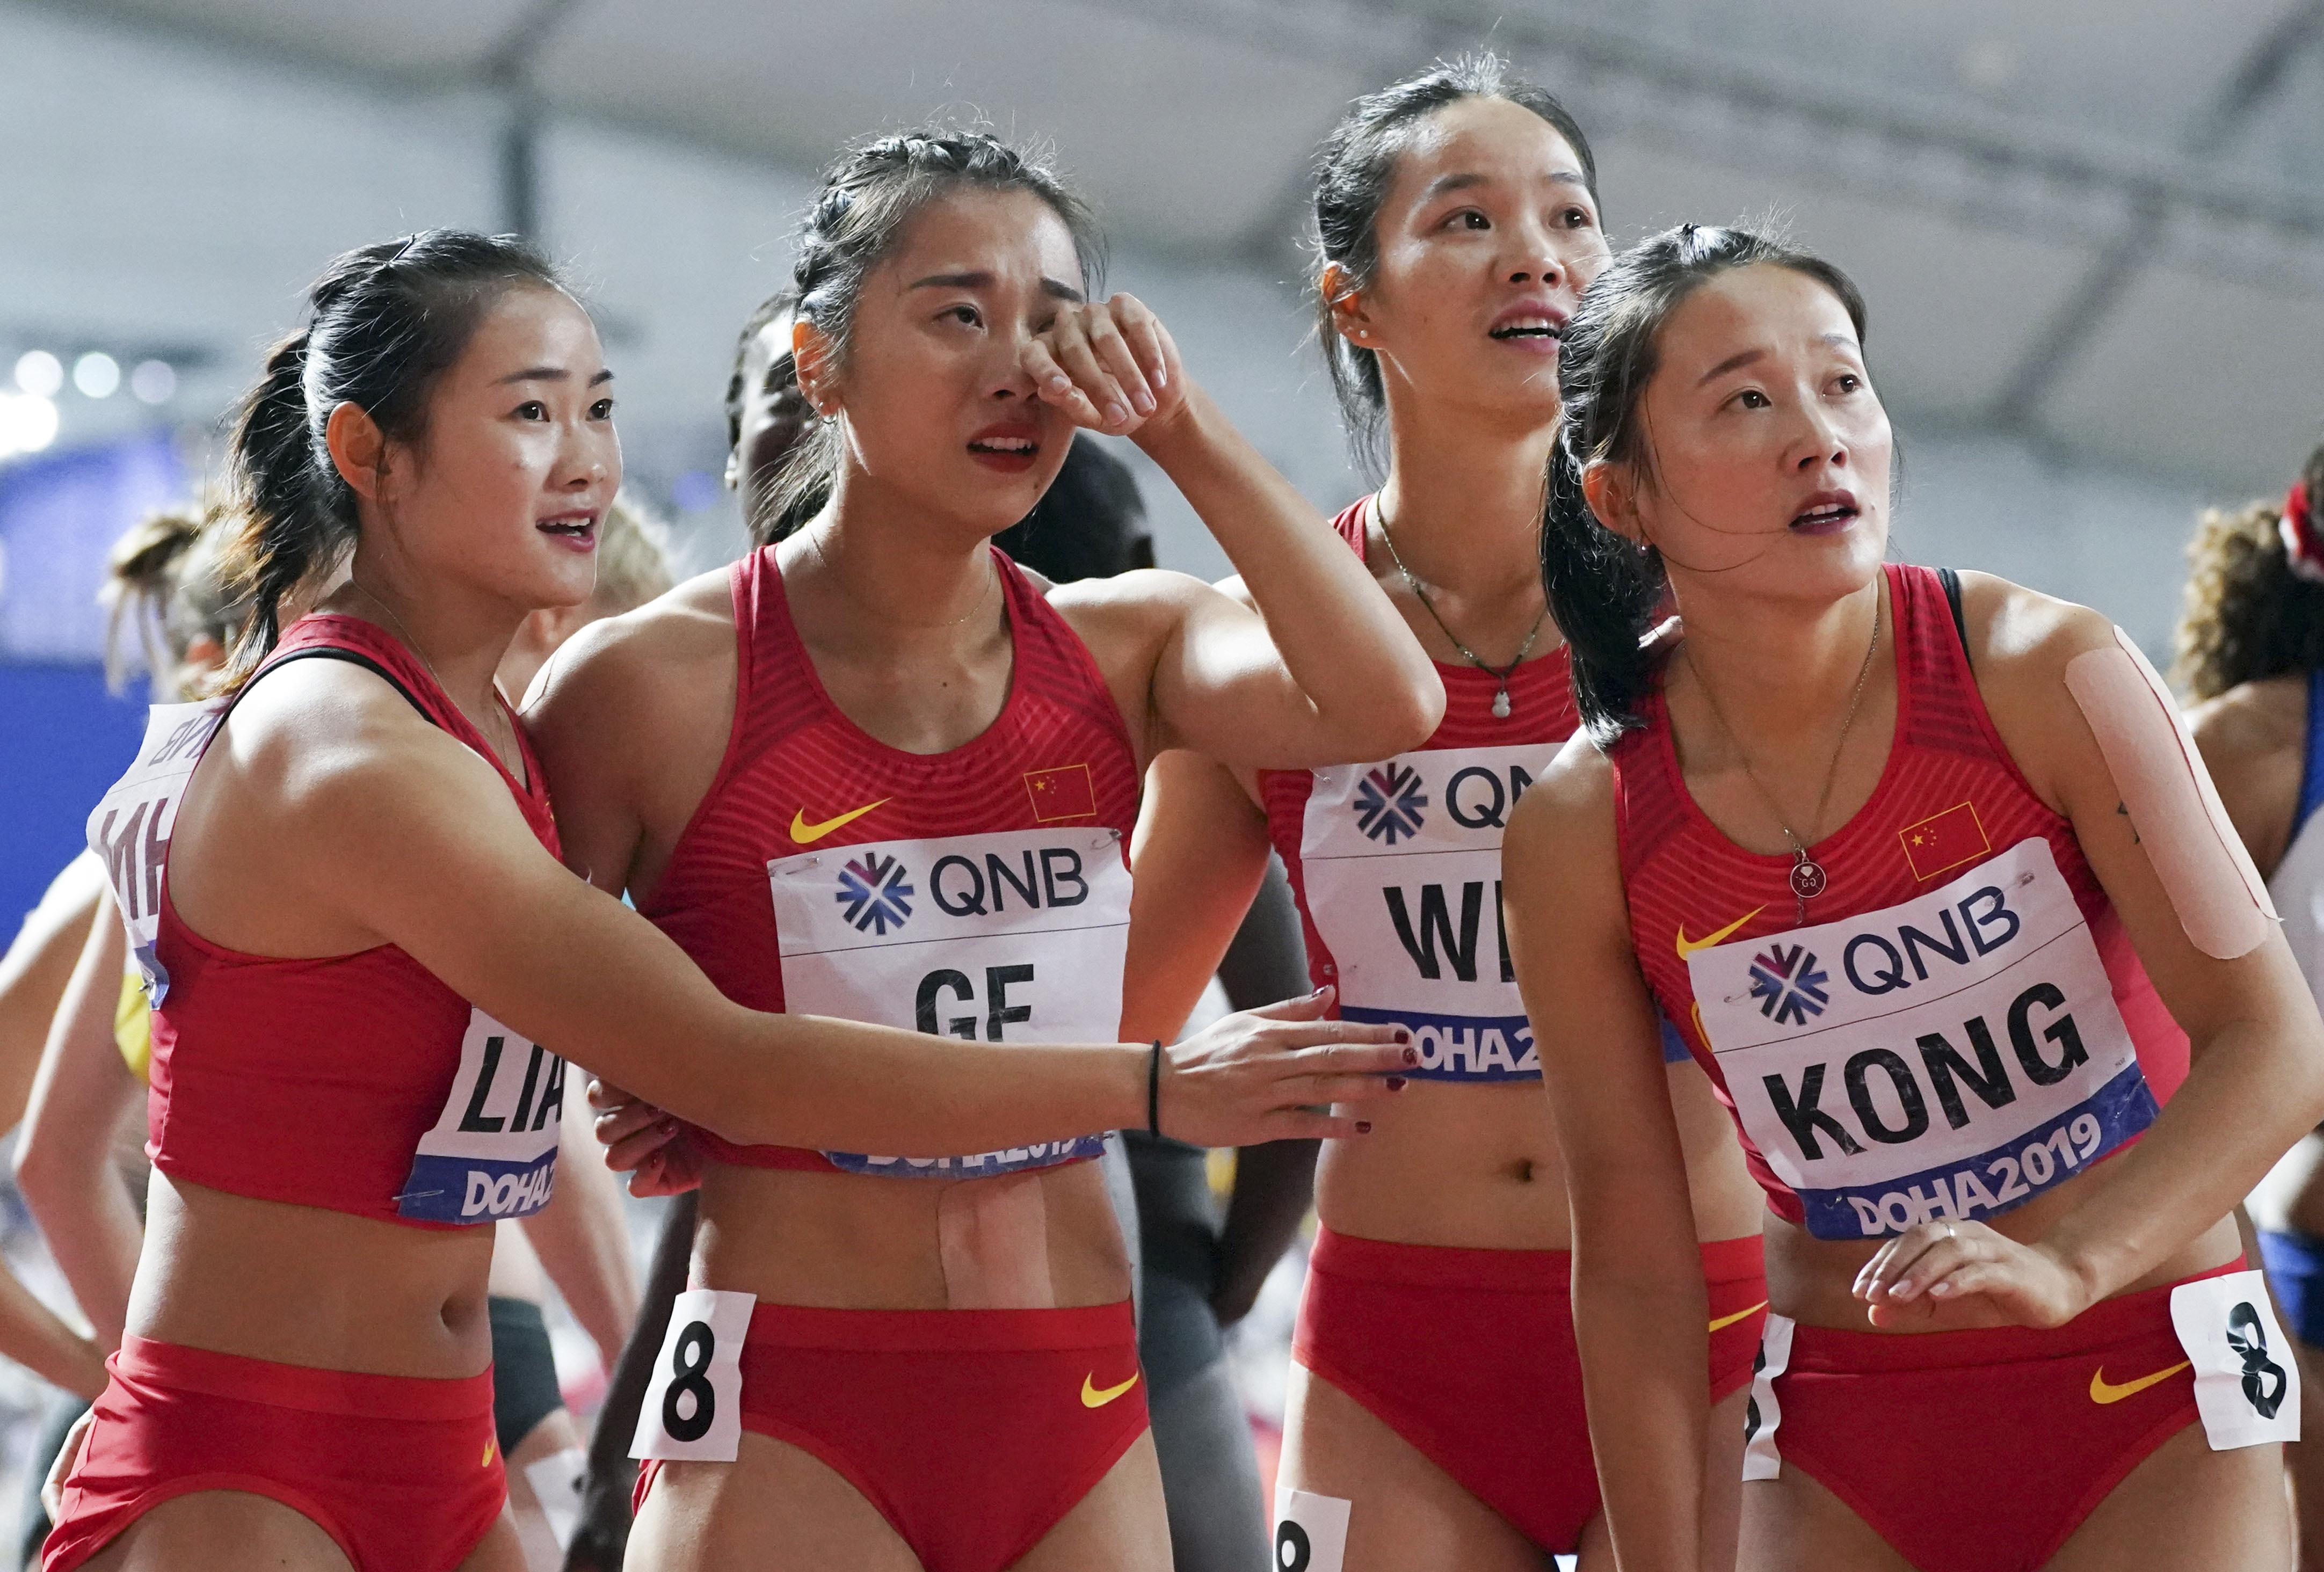 Tokyo 2020 Olympics: Uncertainty is certain